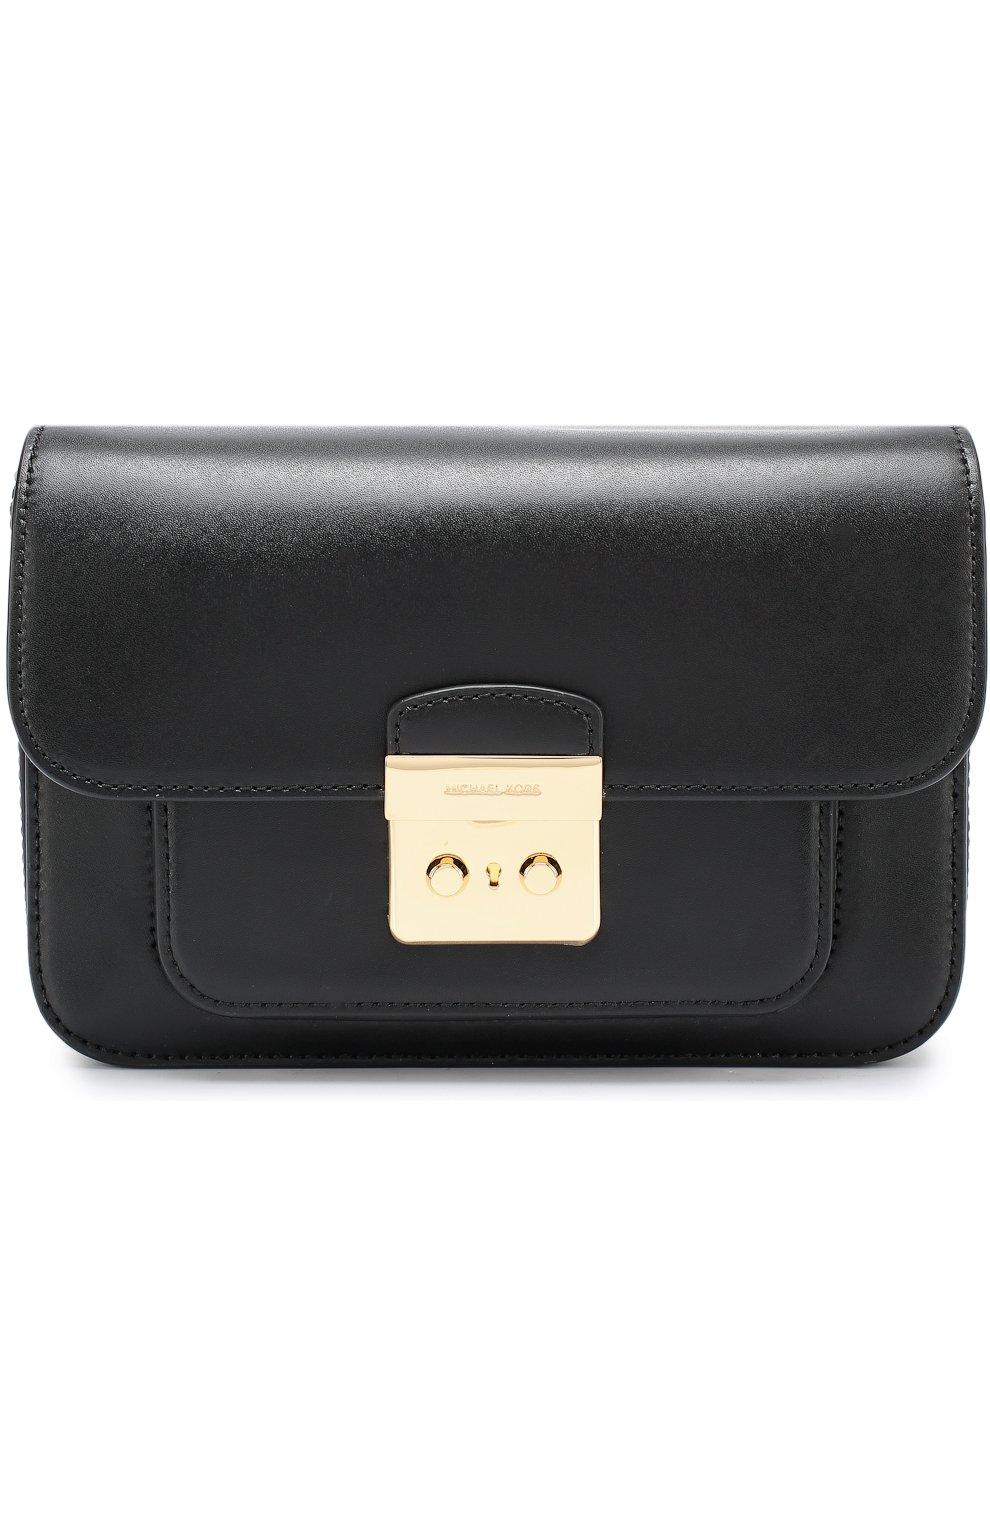 ea4f9c9c6c19 Женская сумка sloan editor MICHAEL MICHAEL KORS черная цвета Китай 5177250  30T7GS9L3L - купить - Цена В Рублях